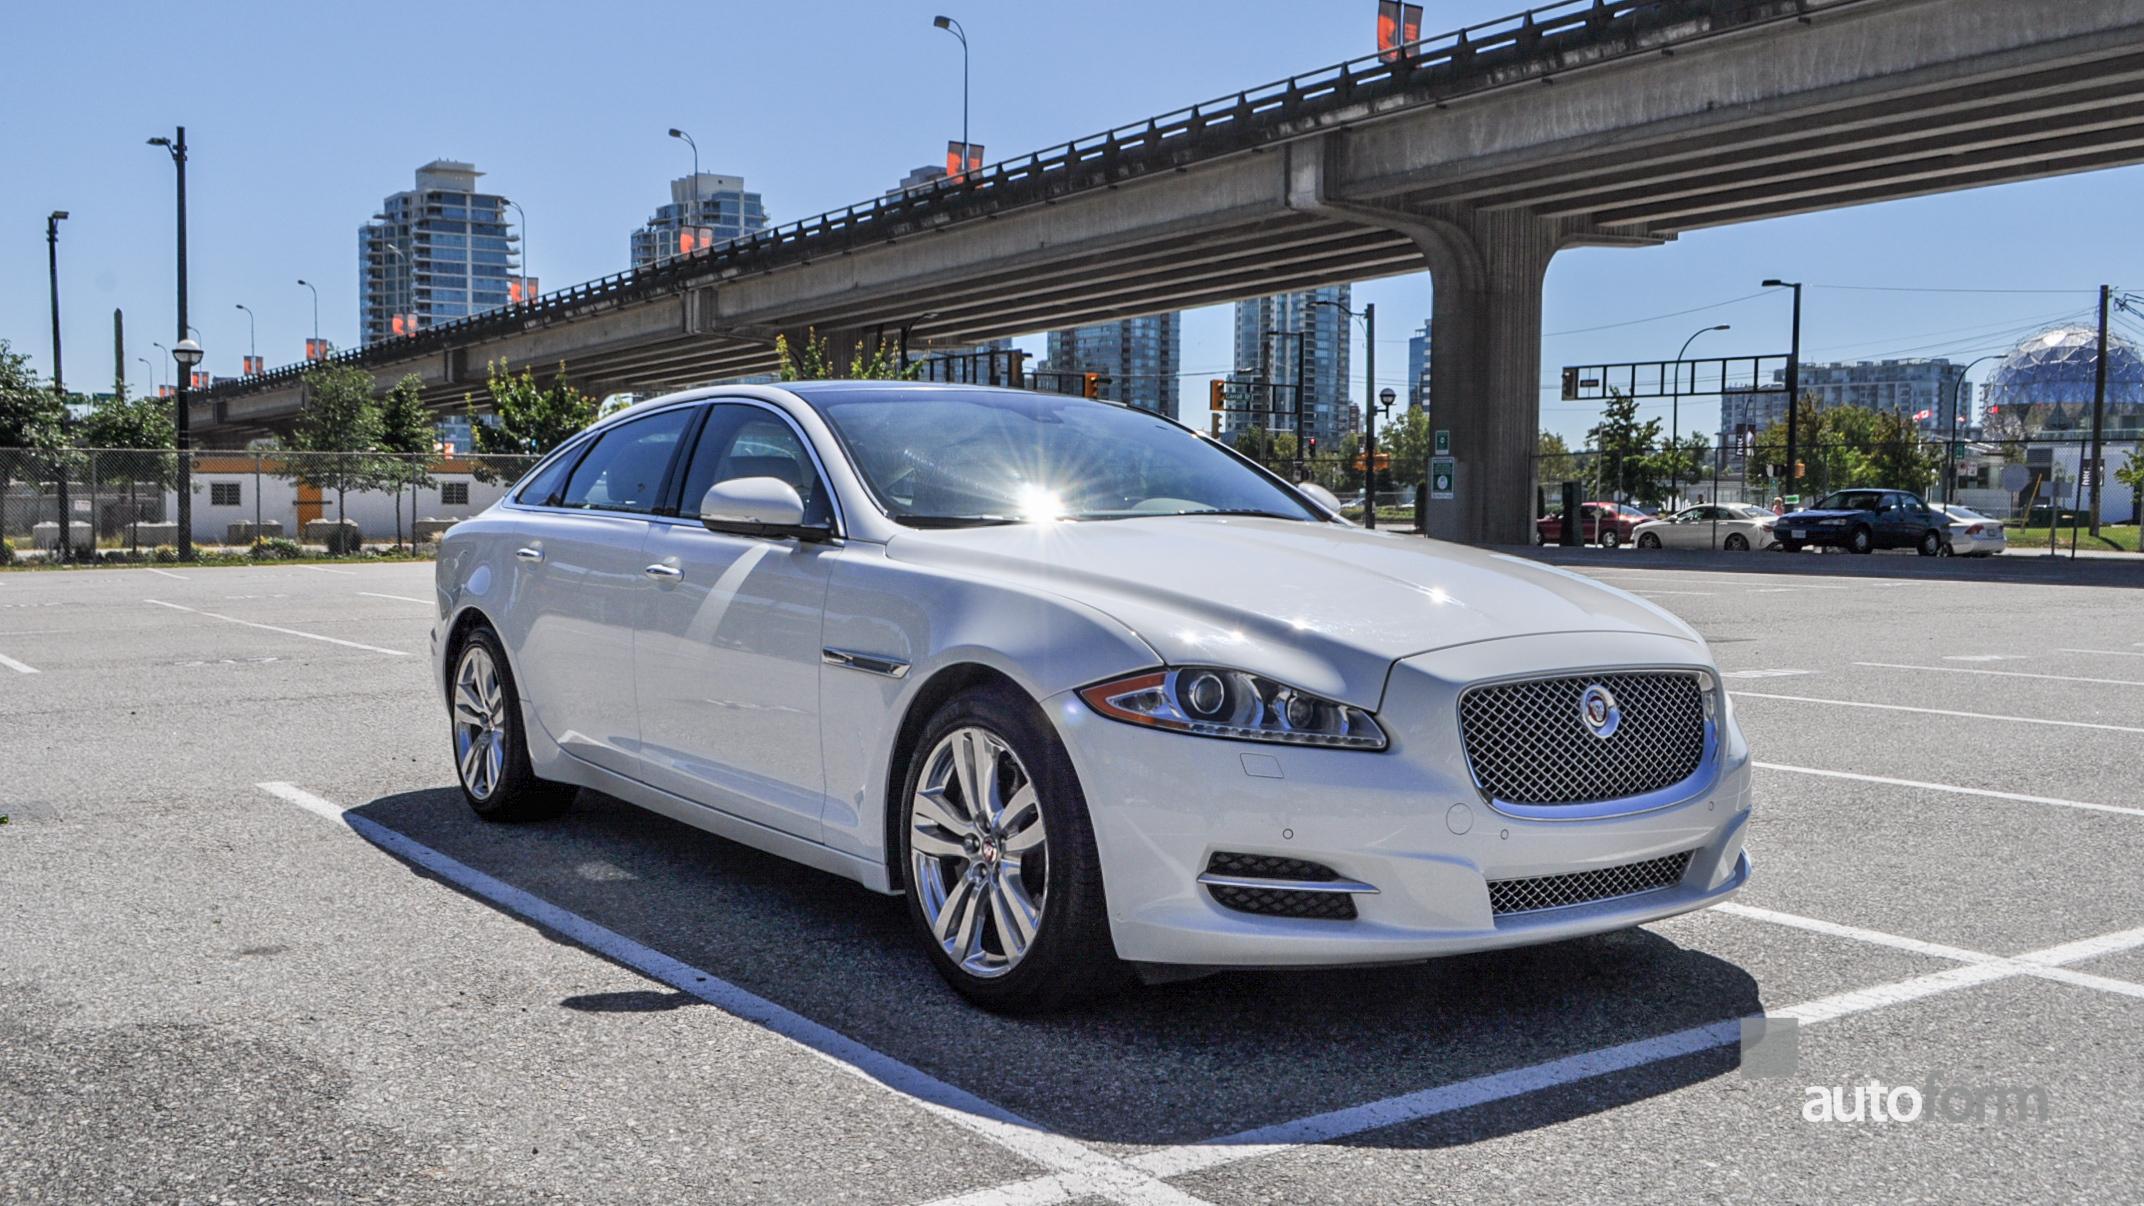 news xjl auto jaguar luxury enhanced xj with features now